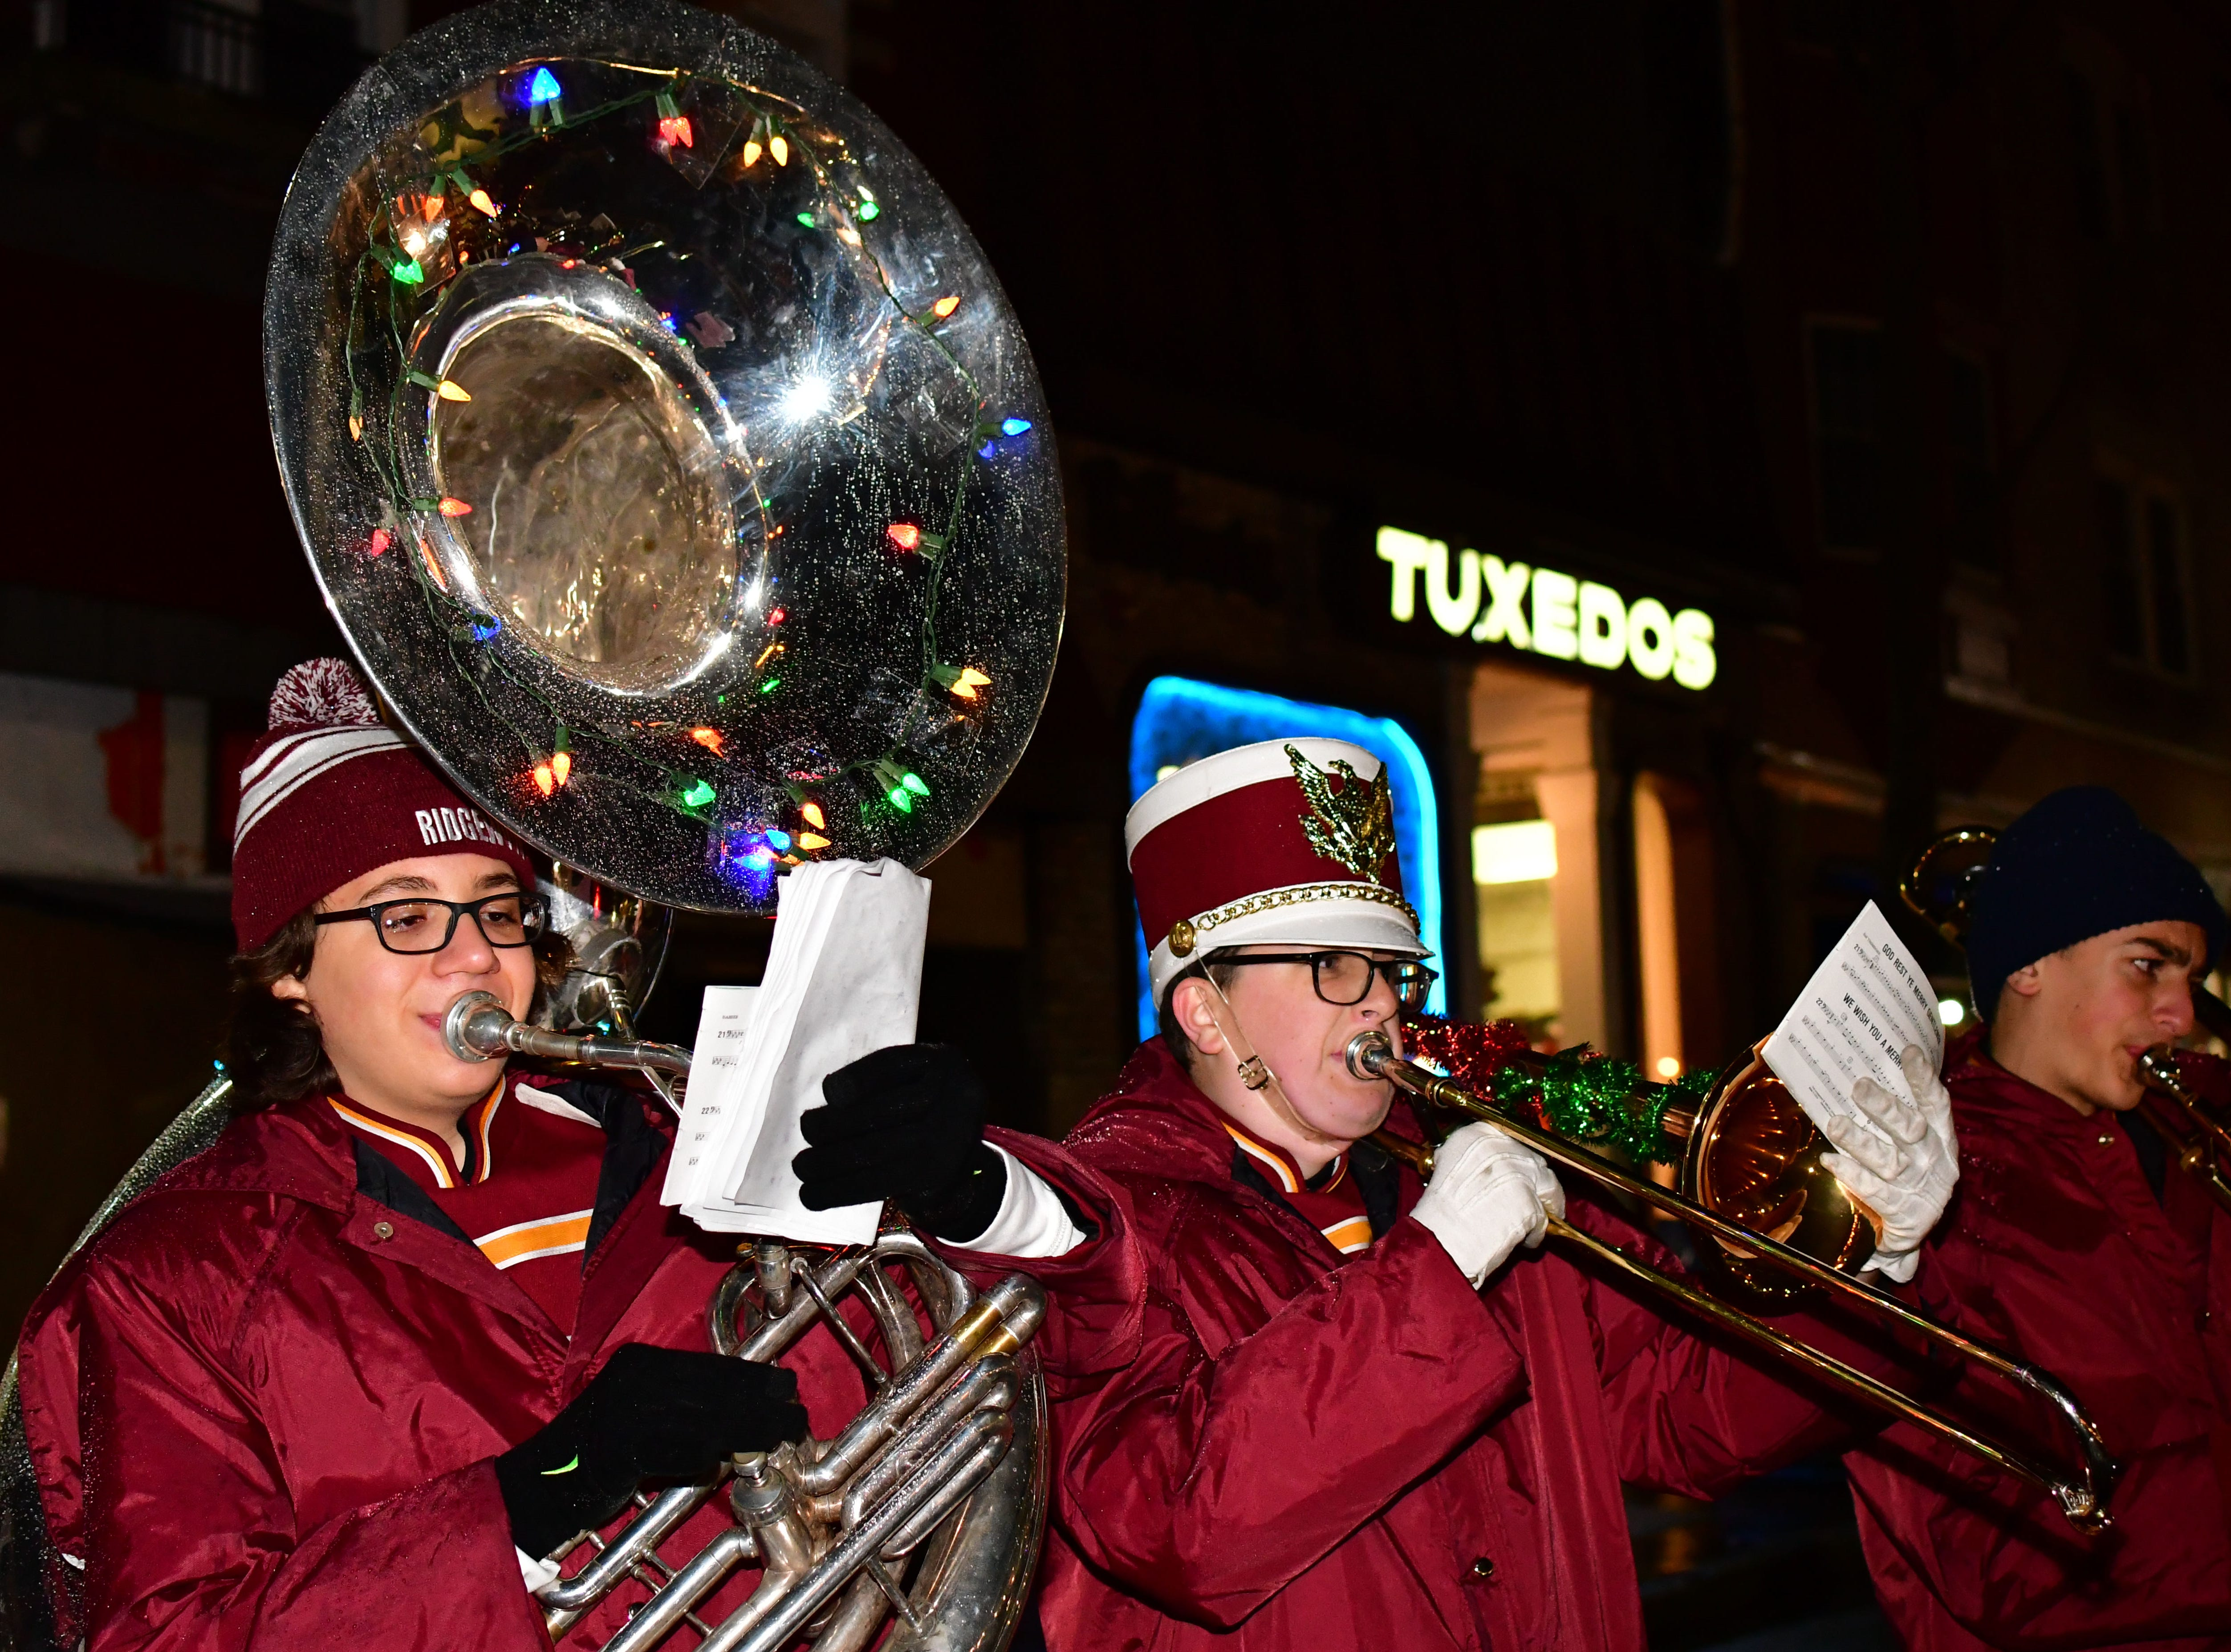 Jake Daghlian, on tuba.  Holiday festivities along East Ridgewood Avenue in Ridgewood on Nov. 30.